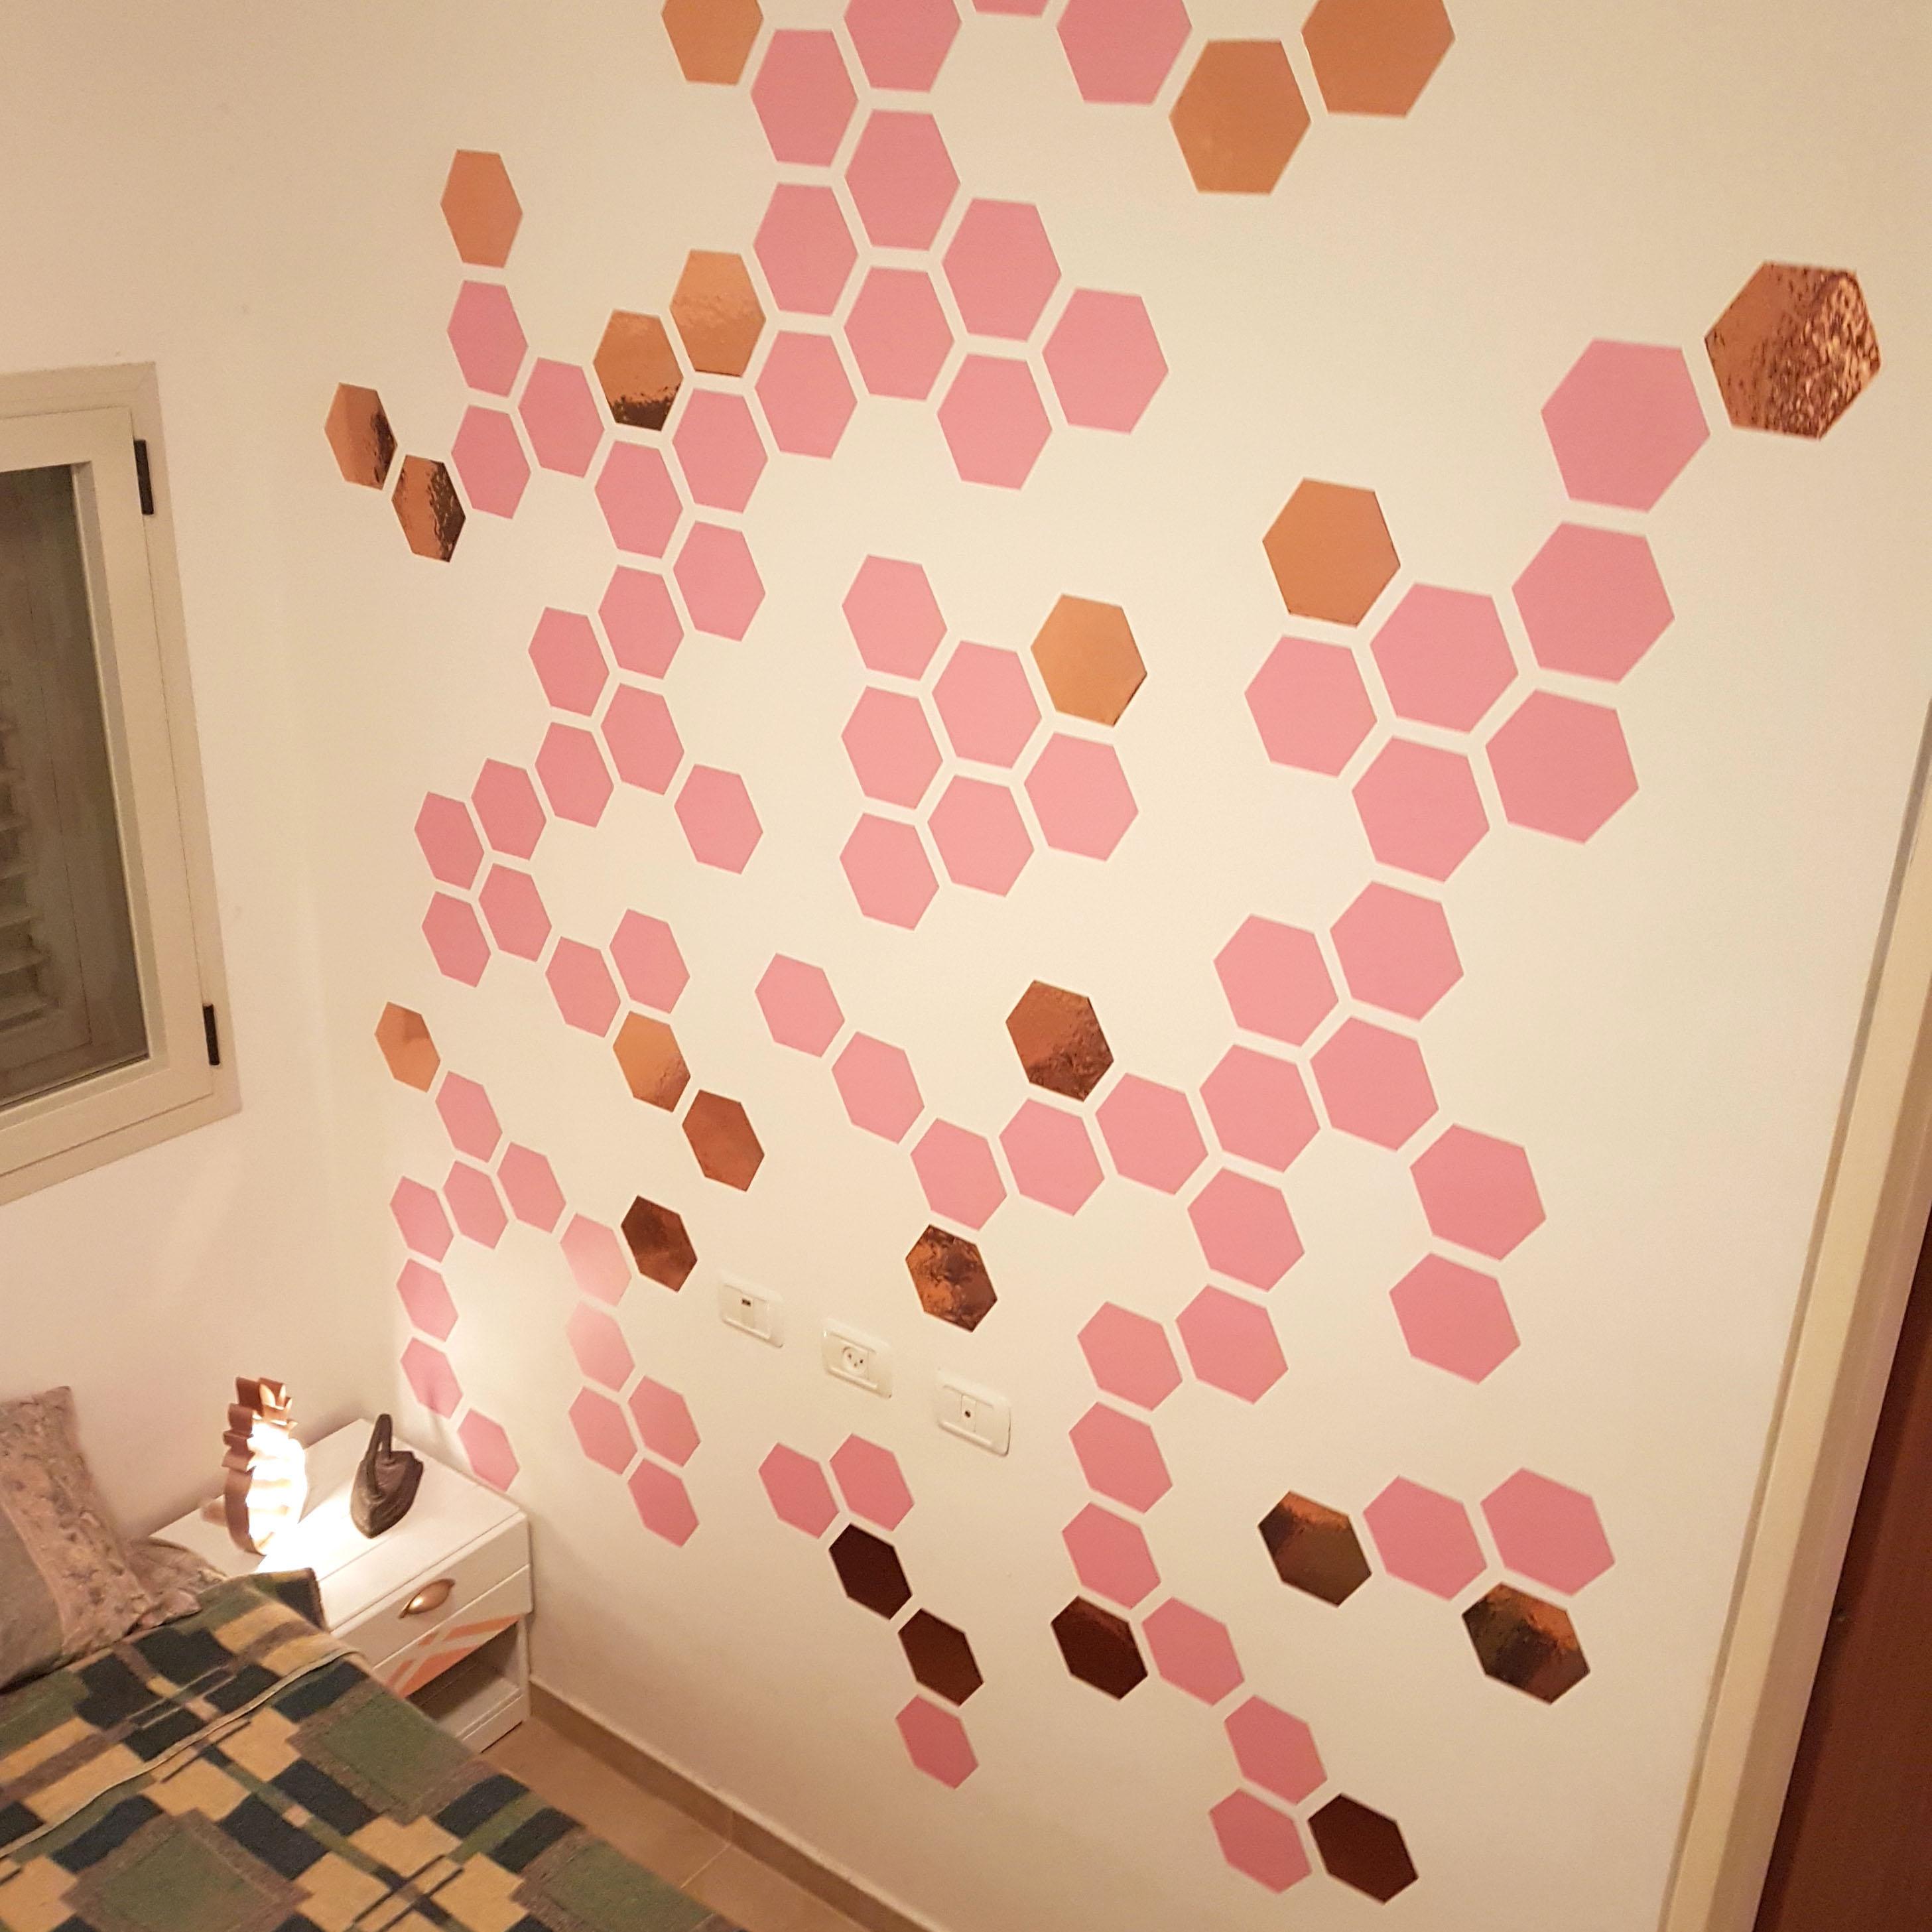 DIY wall stickers from vinyl wallpaper